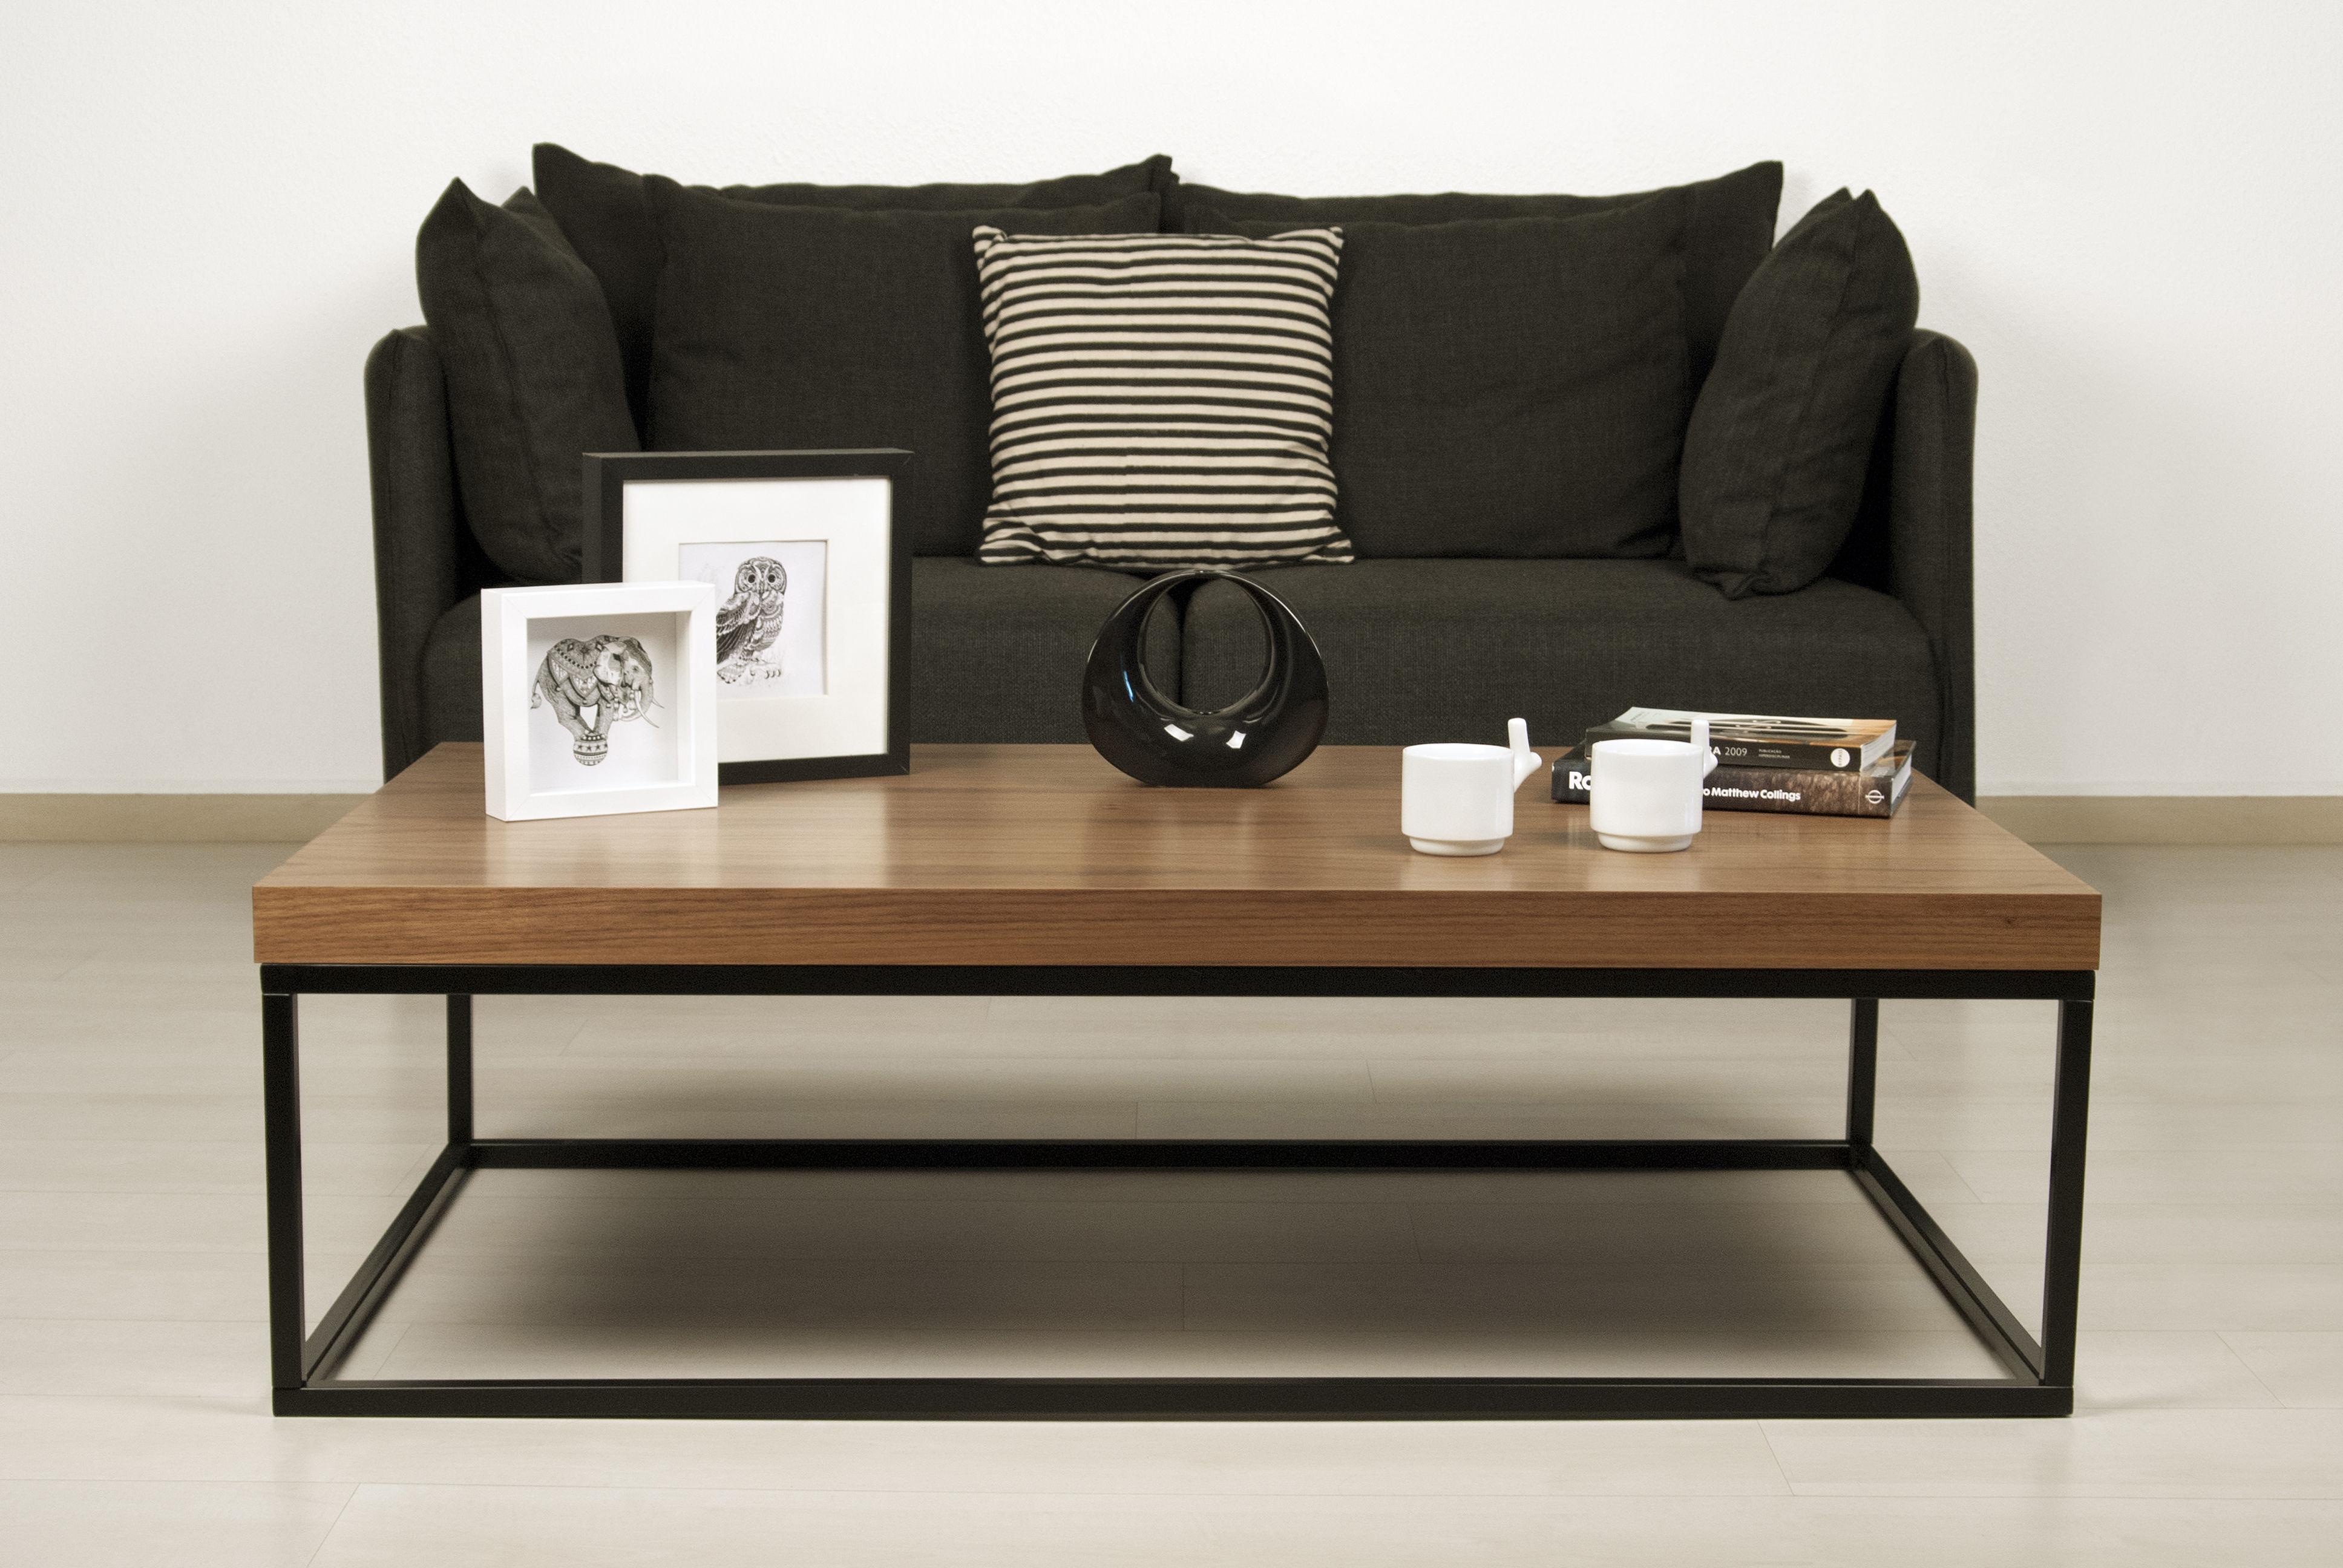 Basse Table Rectangulaire Noyer Pop Up Wallnut Home PZOXiukT